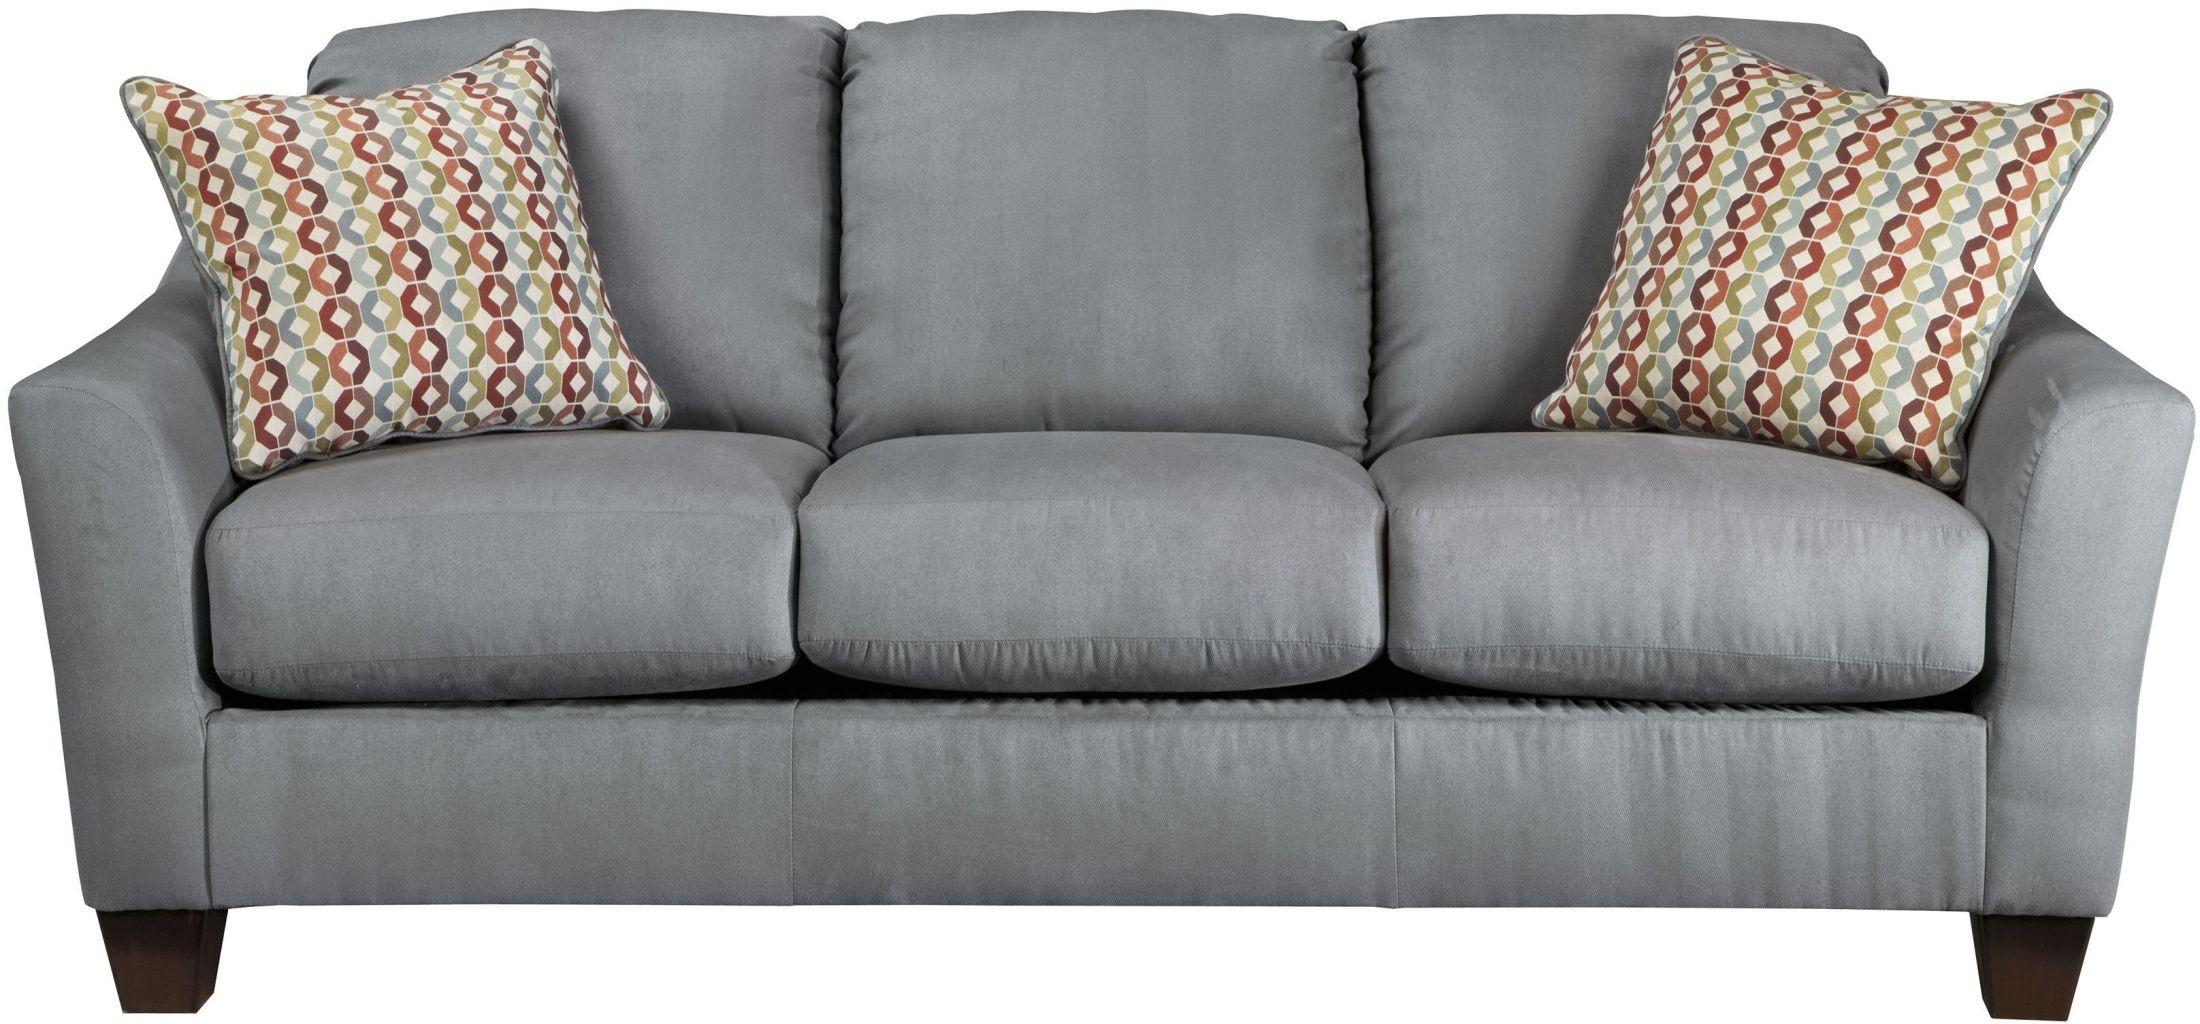 Hannin Lagoon Living Room Set From Ashley 95802 38 35 Coleman Furniture